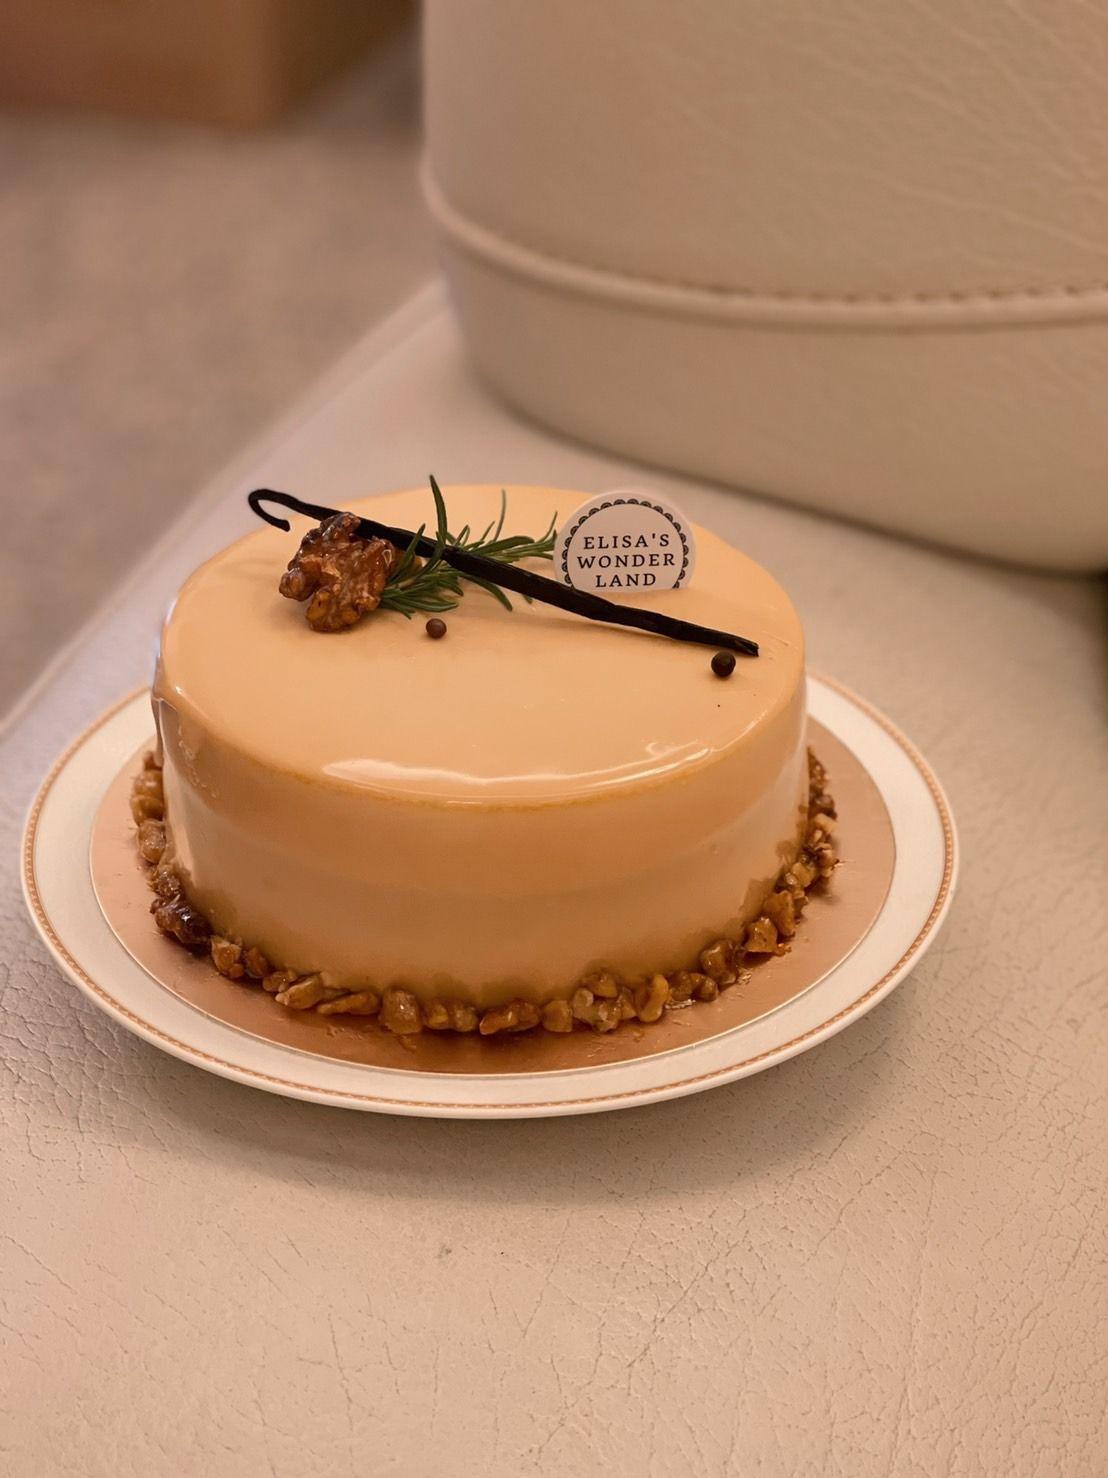 「Elisa\'s Wonderland 愛莉莎的夢遊仙境」焦糖南瓜巧克力慕斯蛋糕